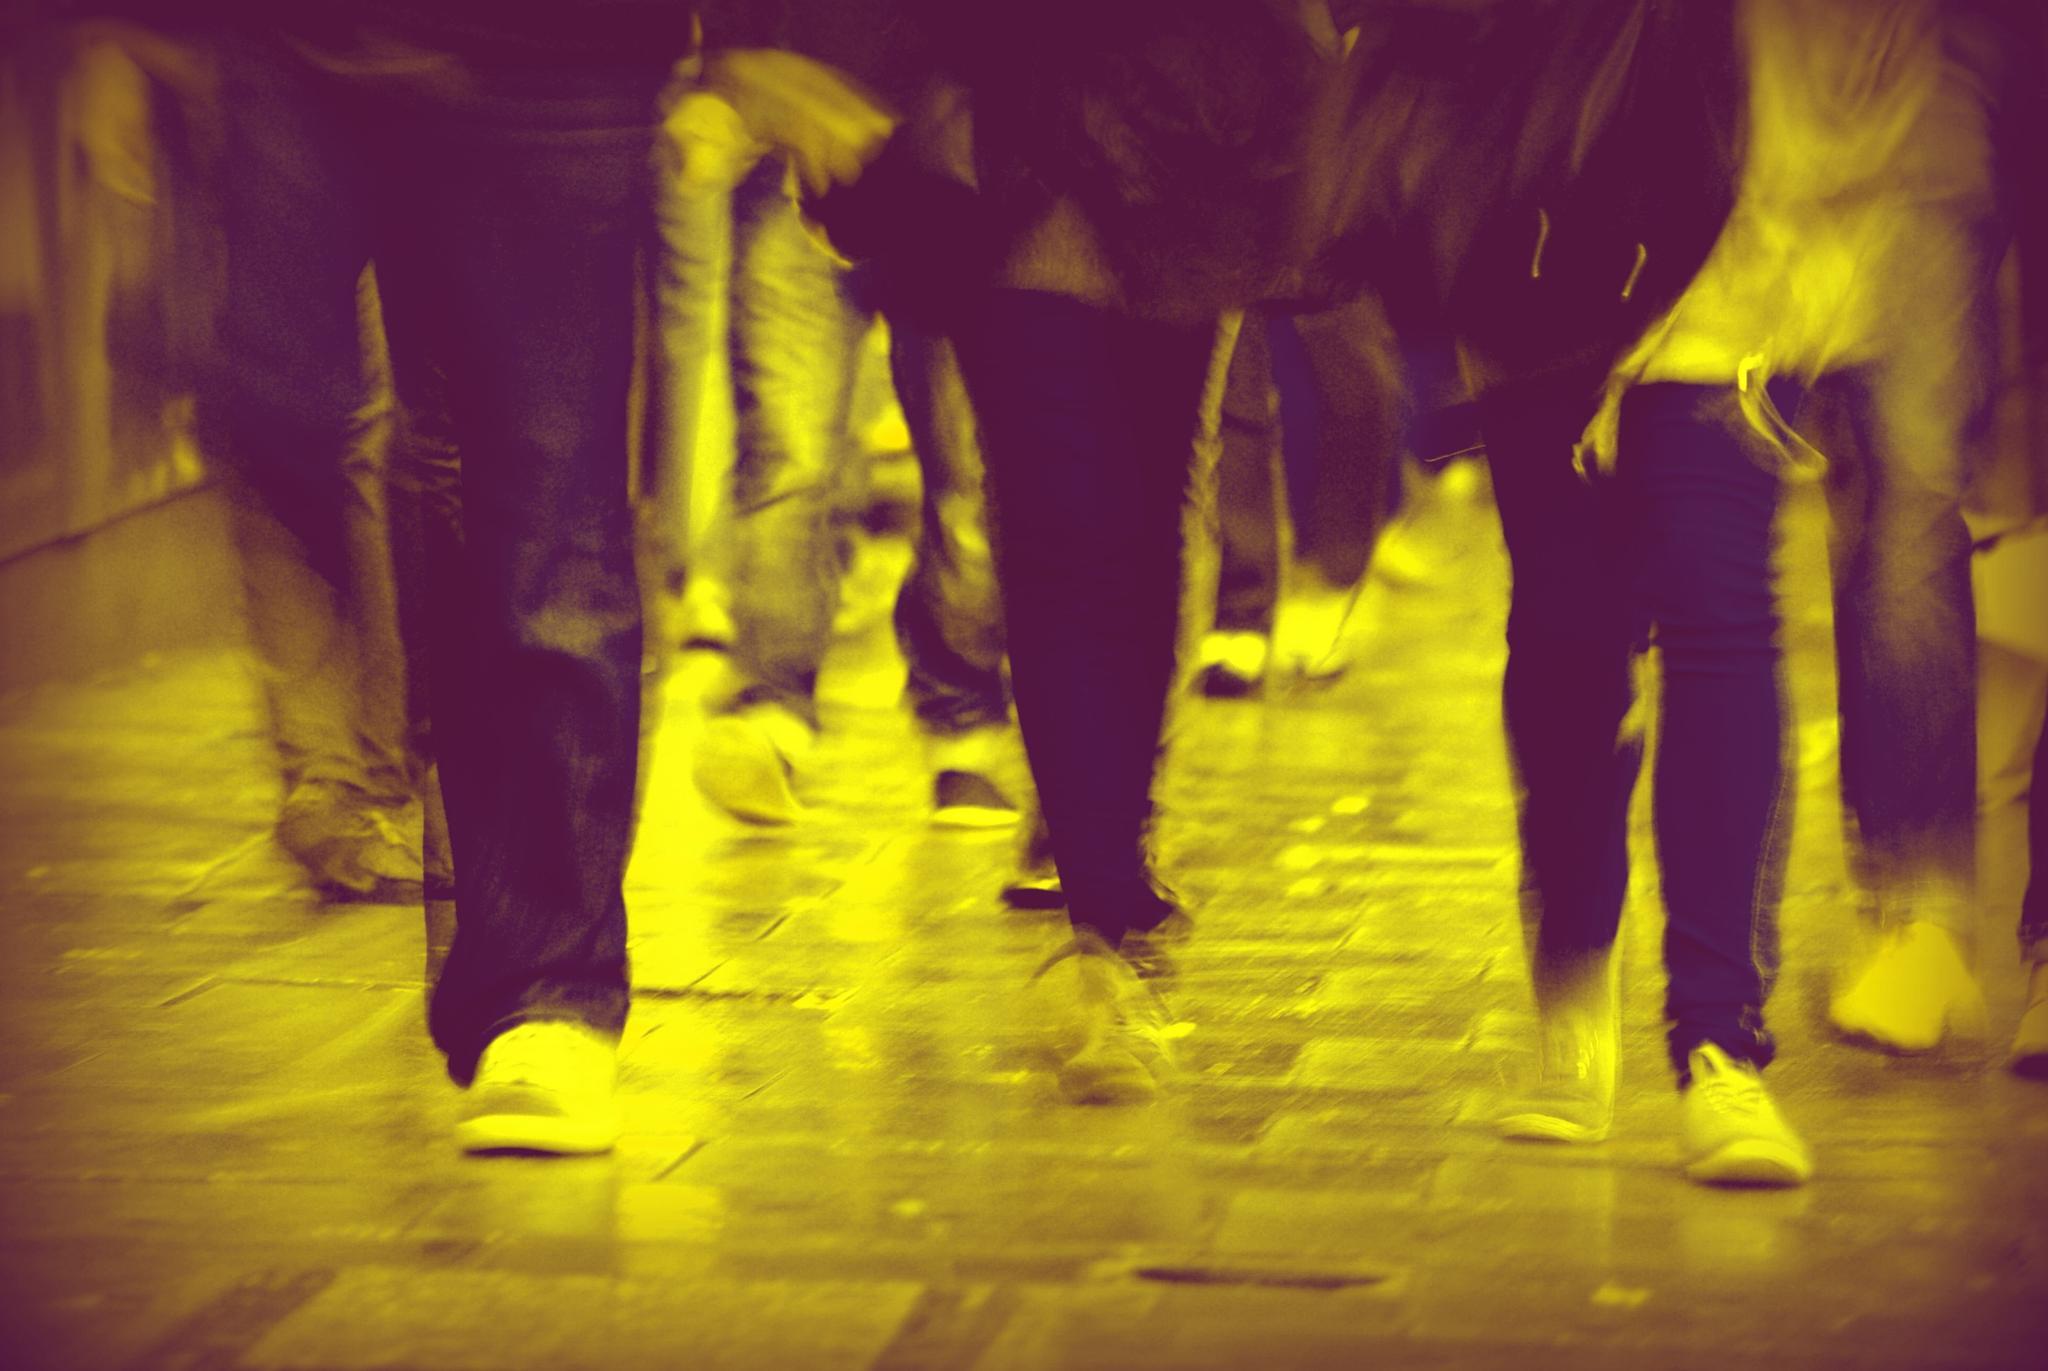 The Walk of London by Kelly-Ann Davies